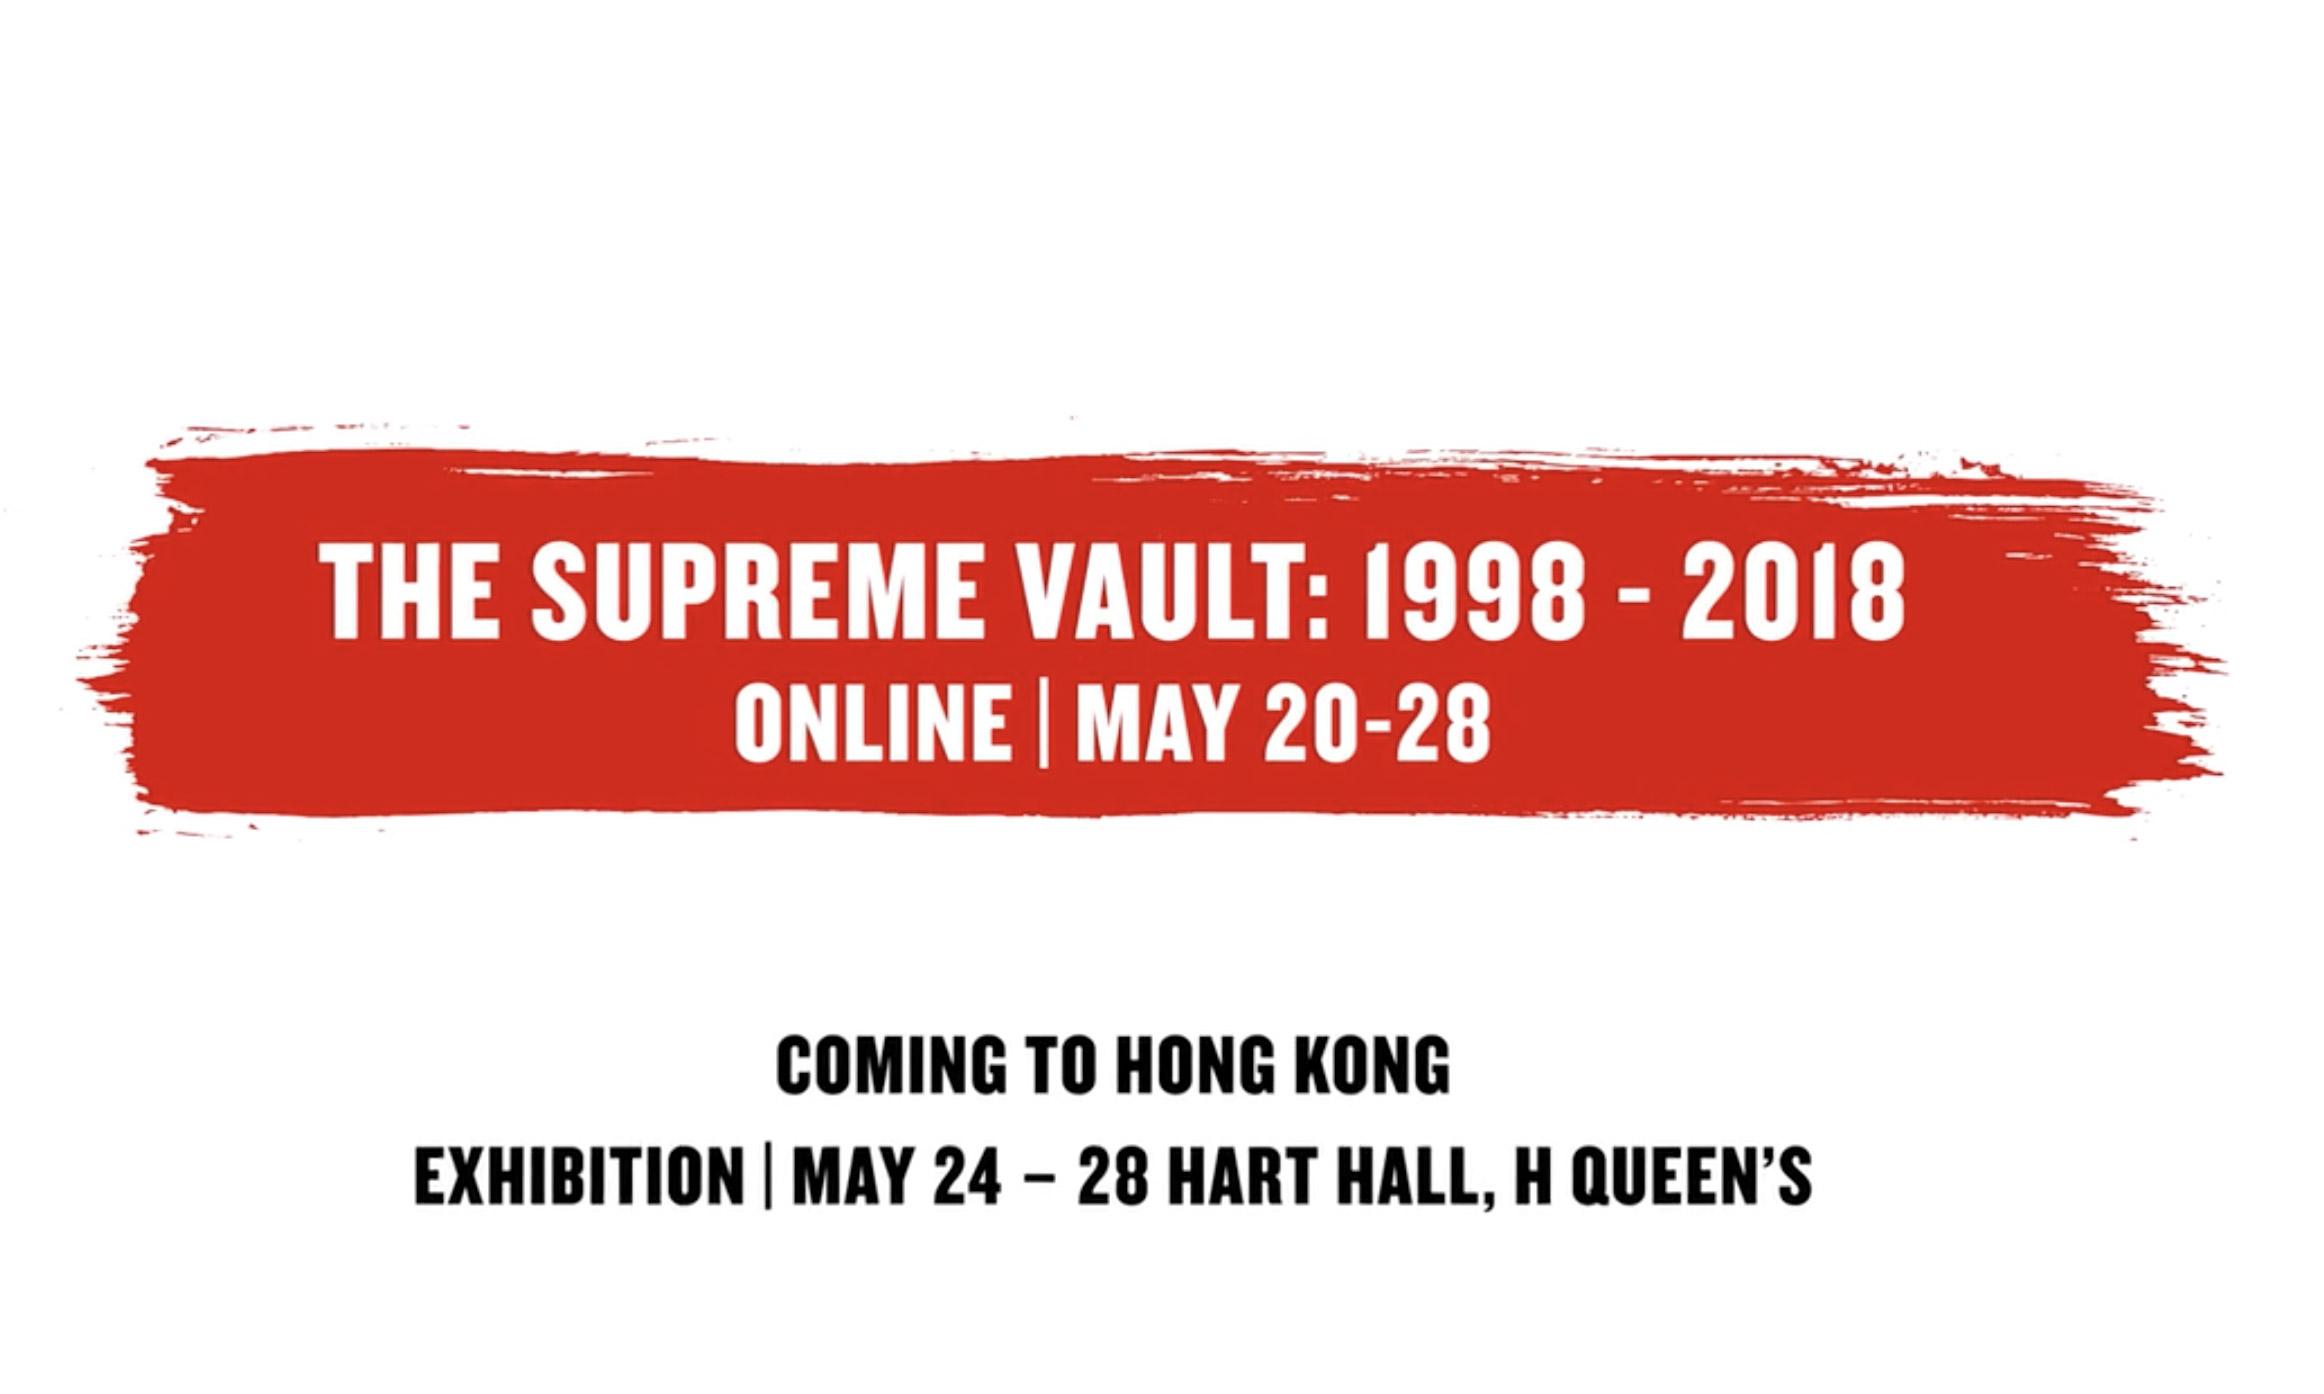 苏富比 5 月呈现《The Supreme Vault: 1998 – 2018》网上专场